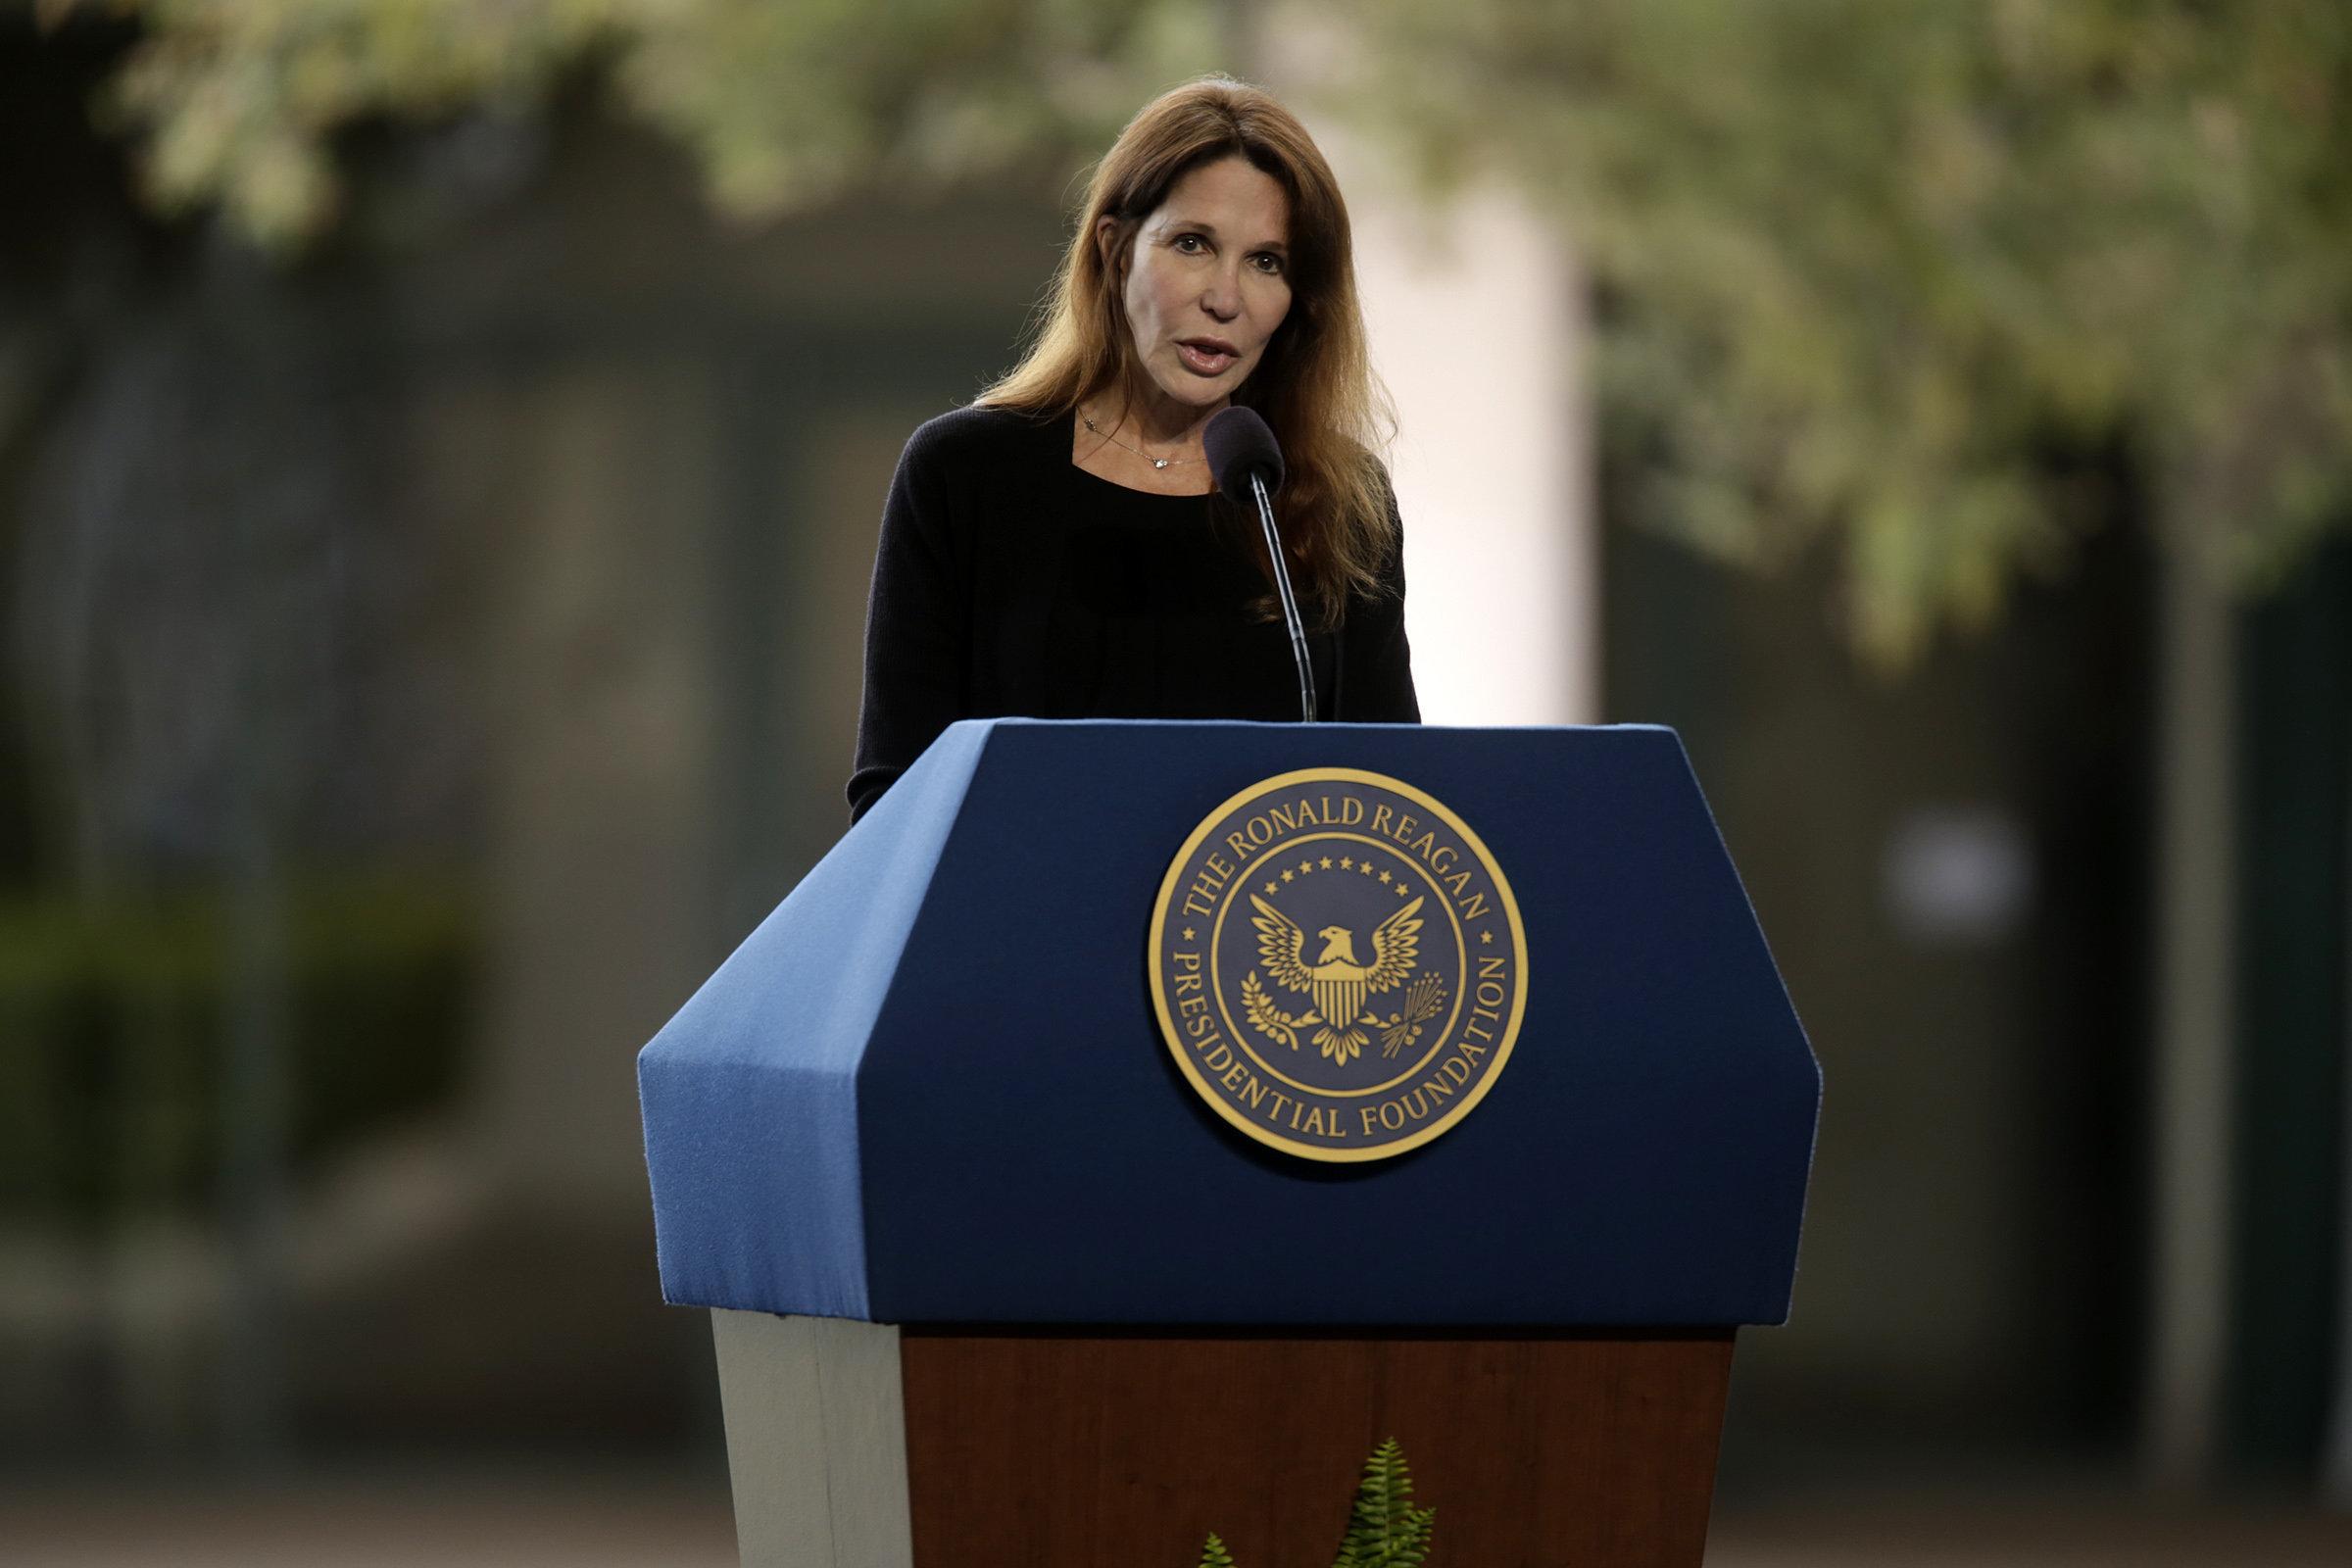 Reagans Daughter Patti Davis Reveals She Didnt Disclose Sex Assault For Decades